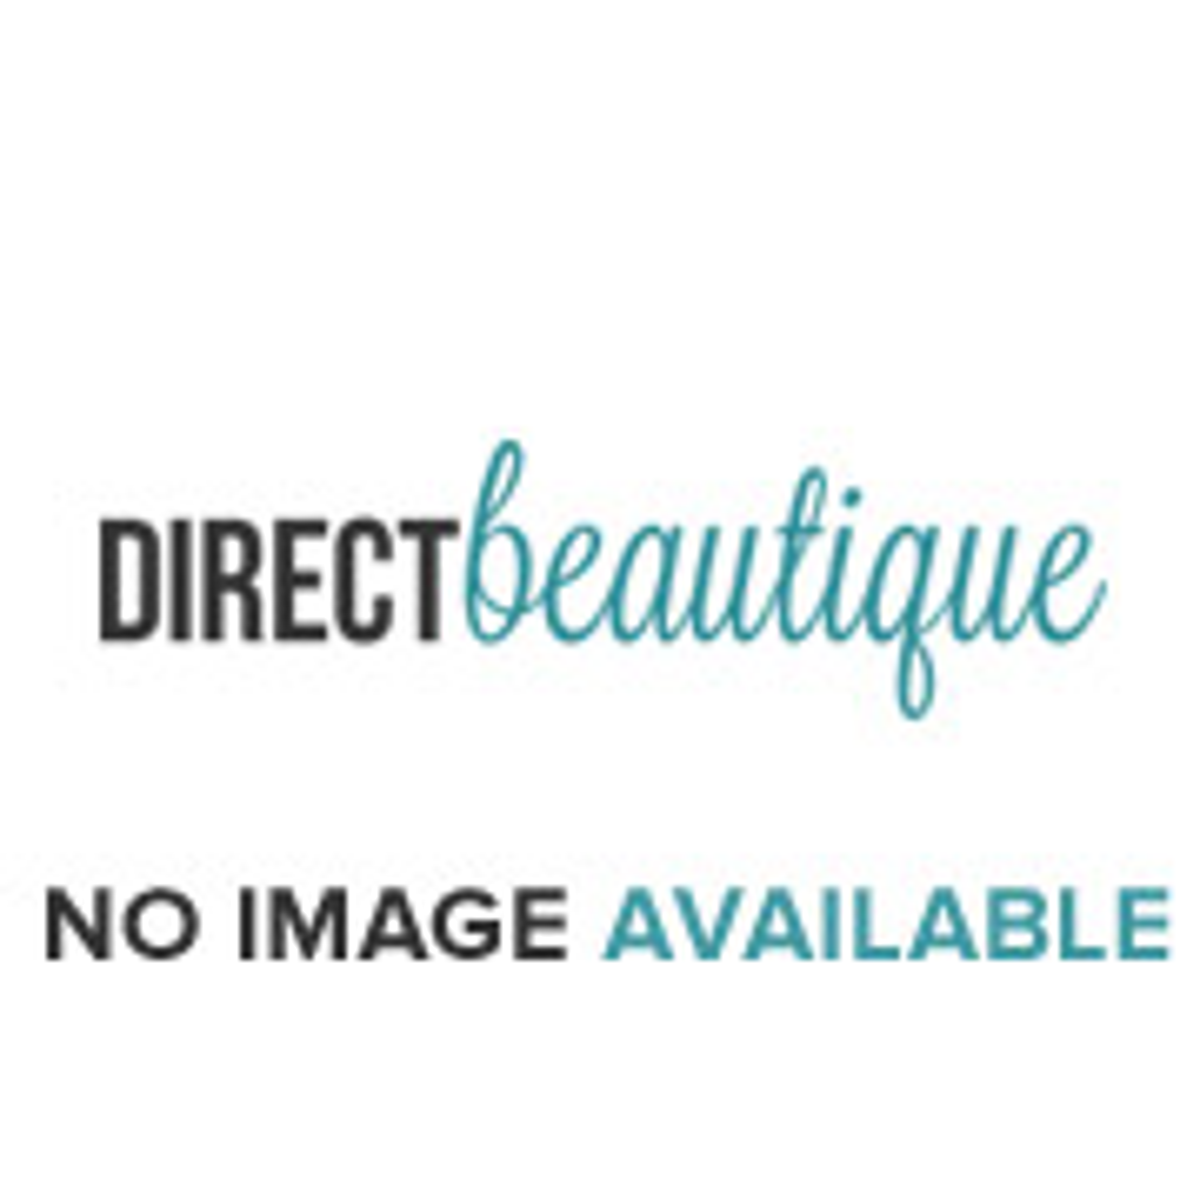 L'Oreal Morphose Matte Souffle Foundation 20ml Beige Apricot